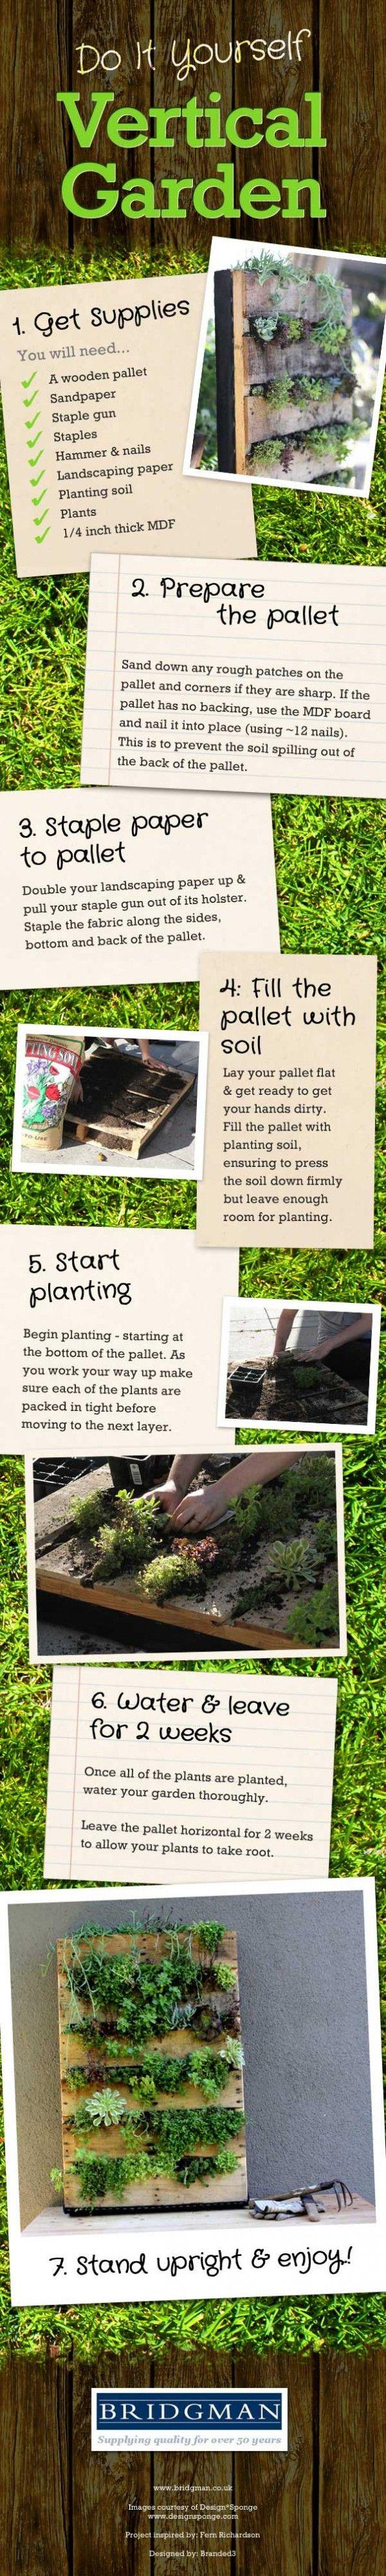 Do-it-yourself Vertical Garden Infographic